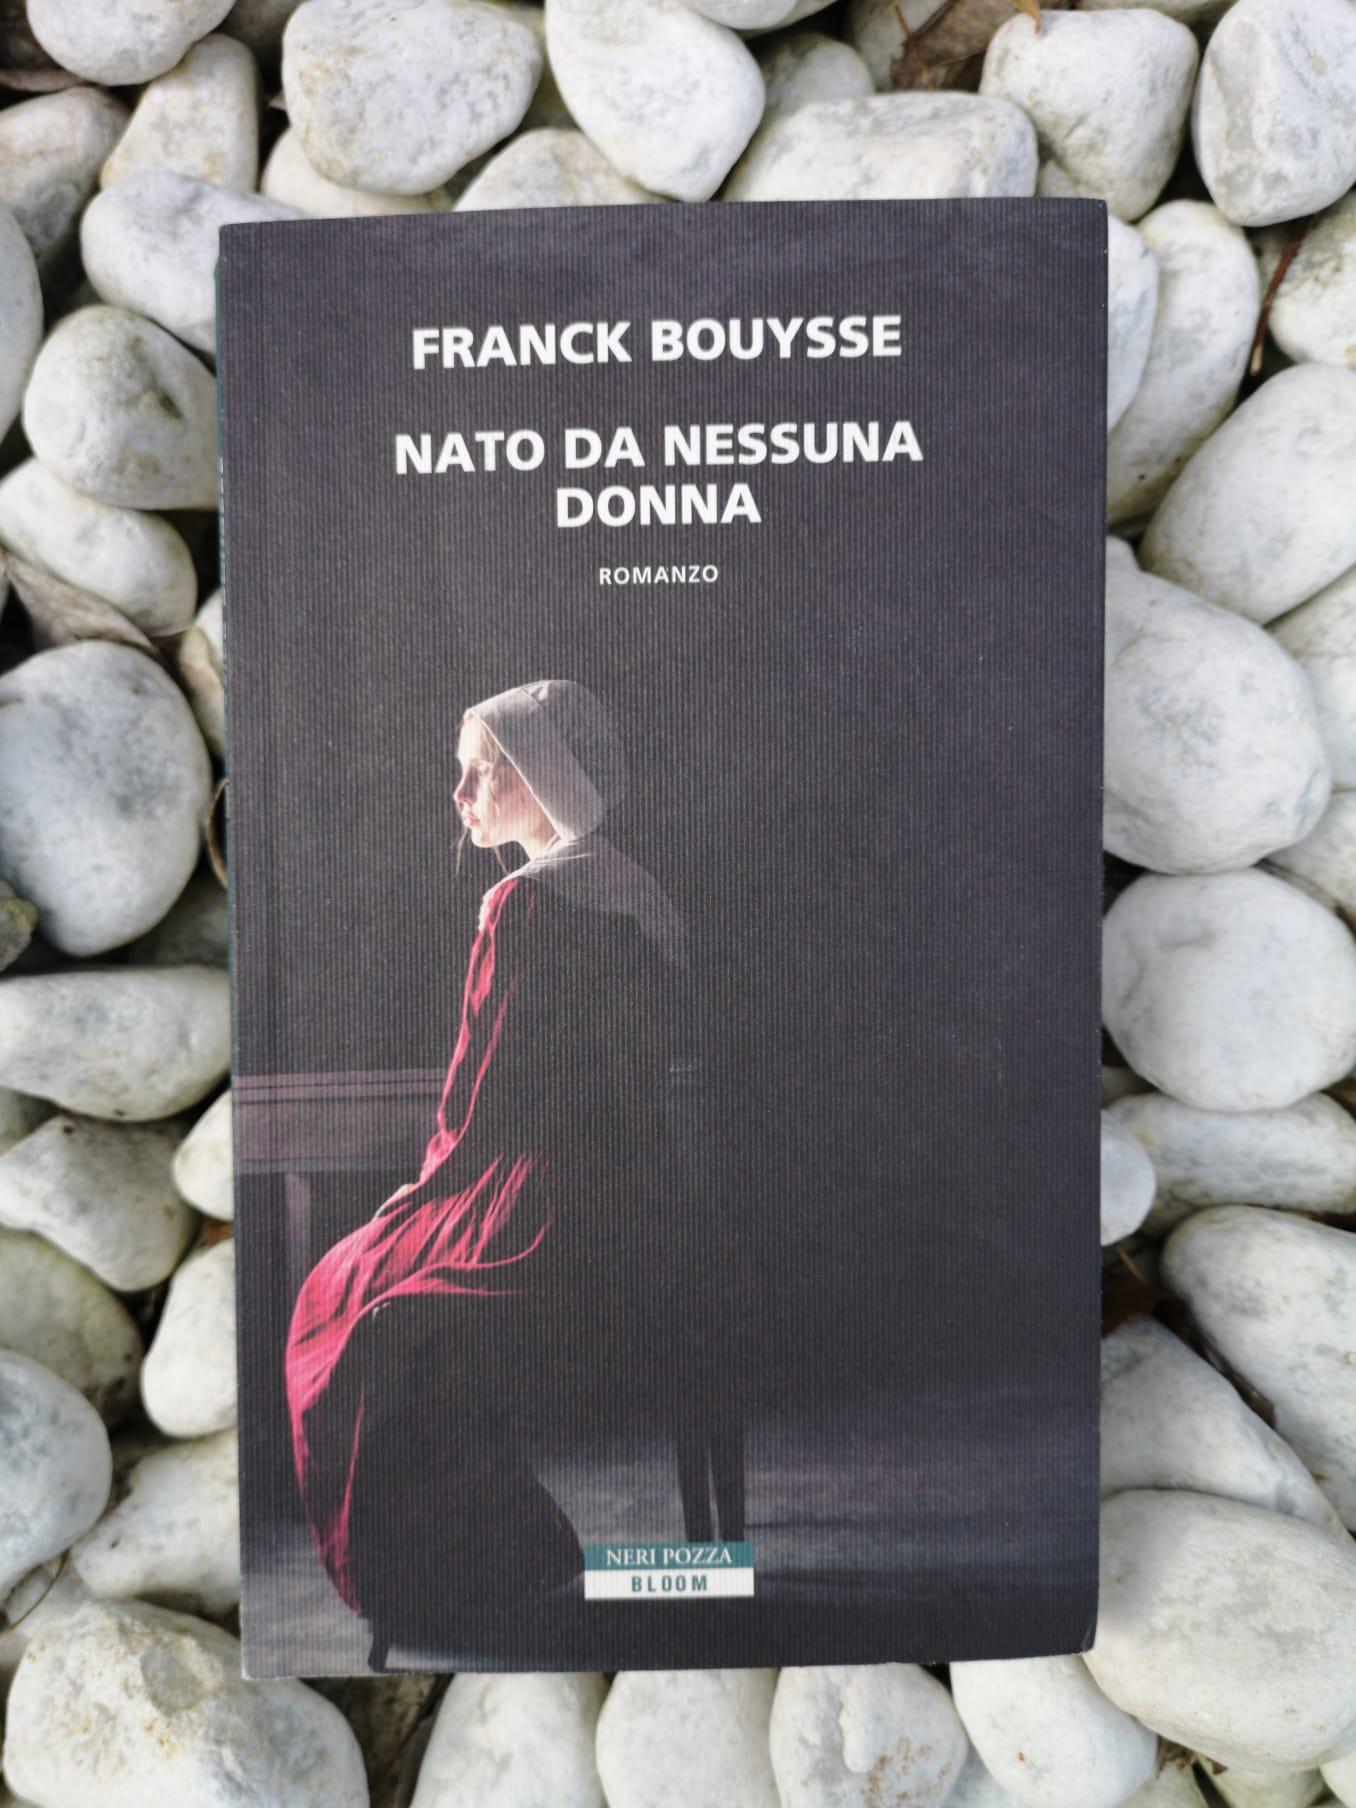 Franck Bouysse - Nato da nessuna donna